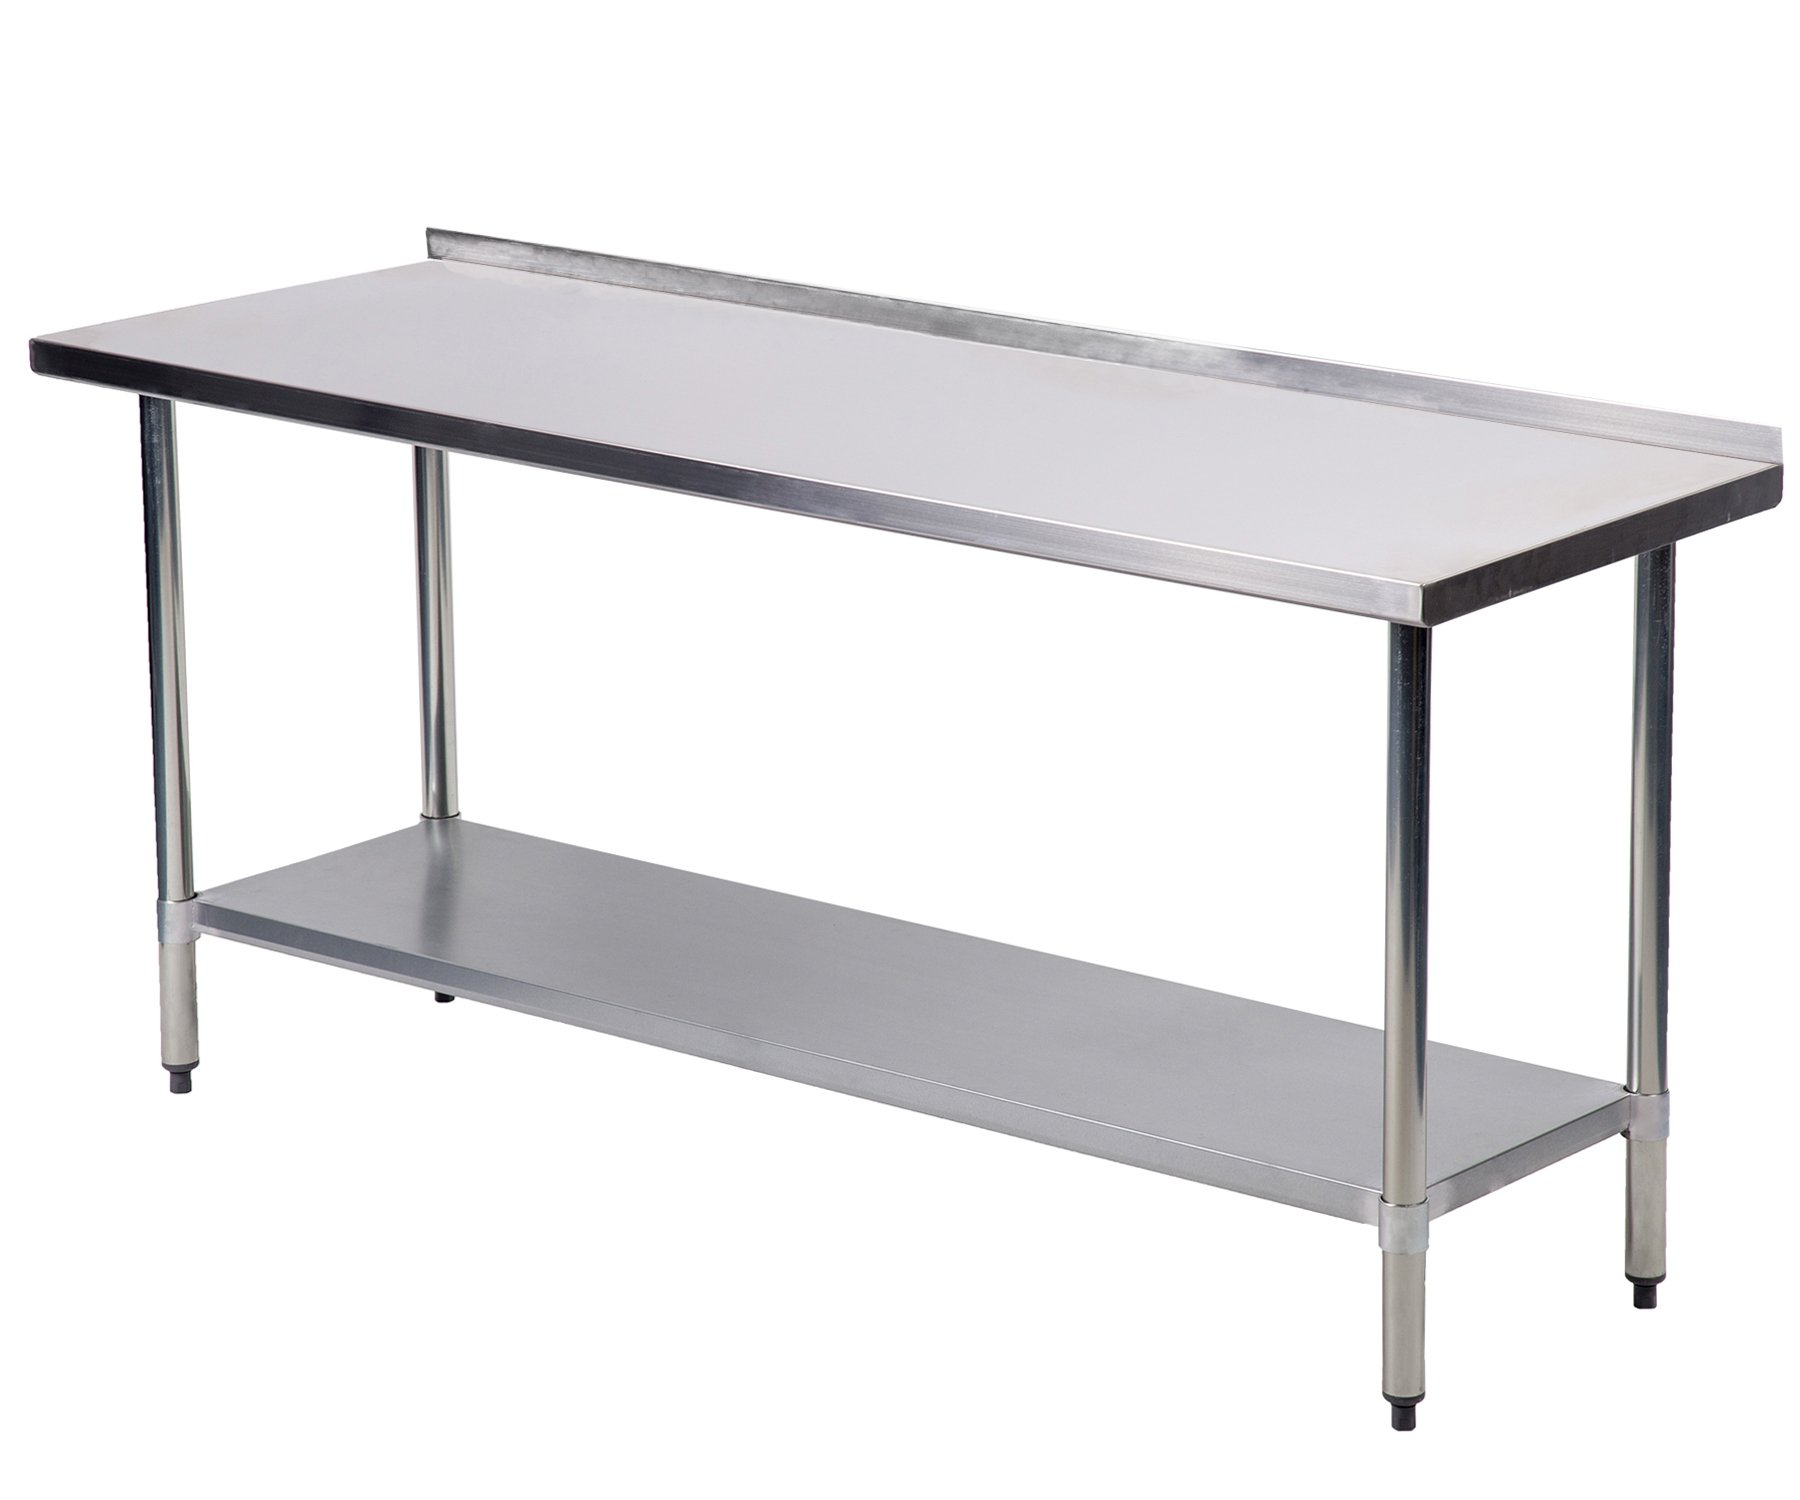 24''x60''Stainless Steel Work Table w/Backsplash Kitchen Restaurant Table Eb